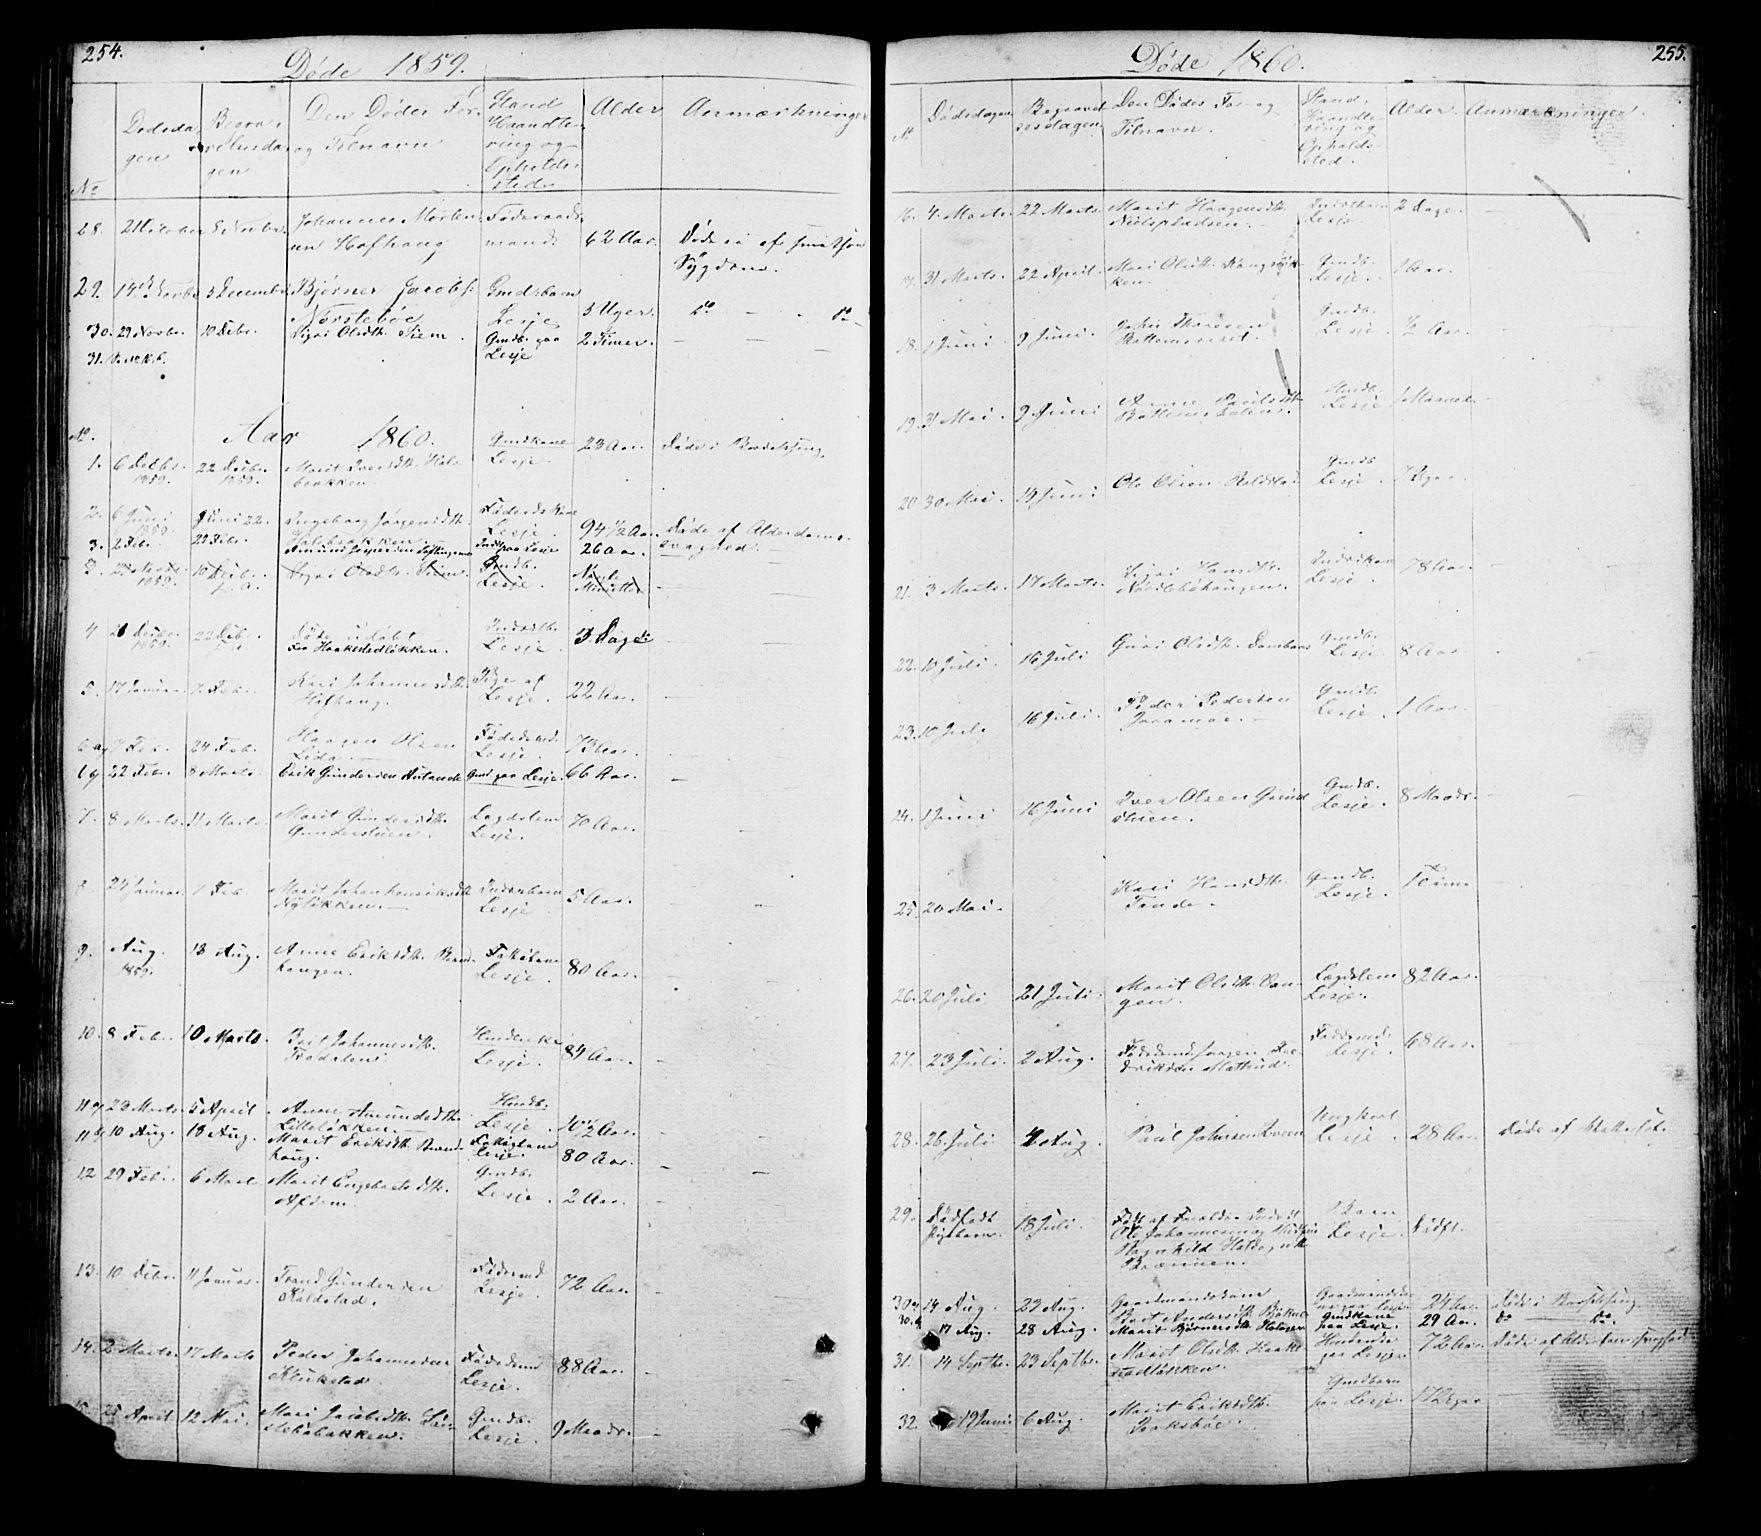 SAH, Lesja prestekontor, Klokkerbok nr. 5, 1850-1894, s. 254-255